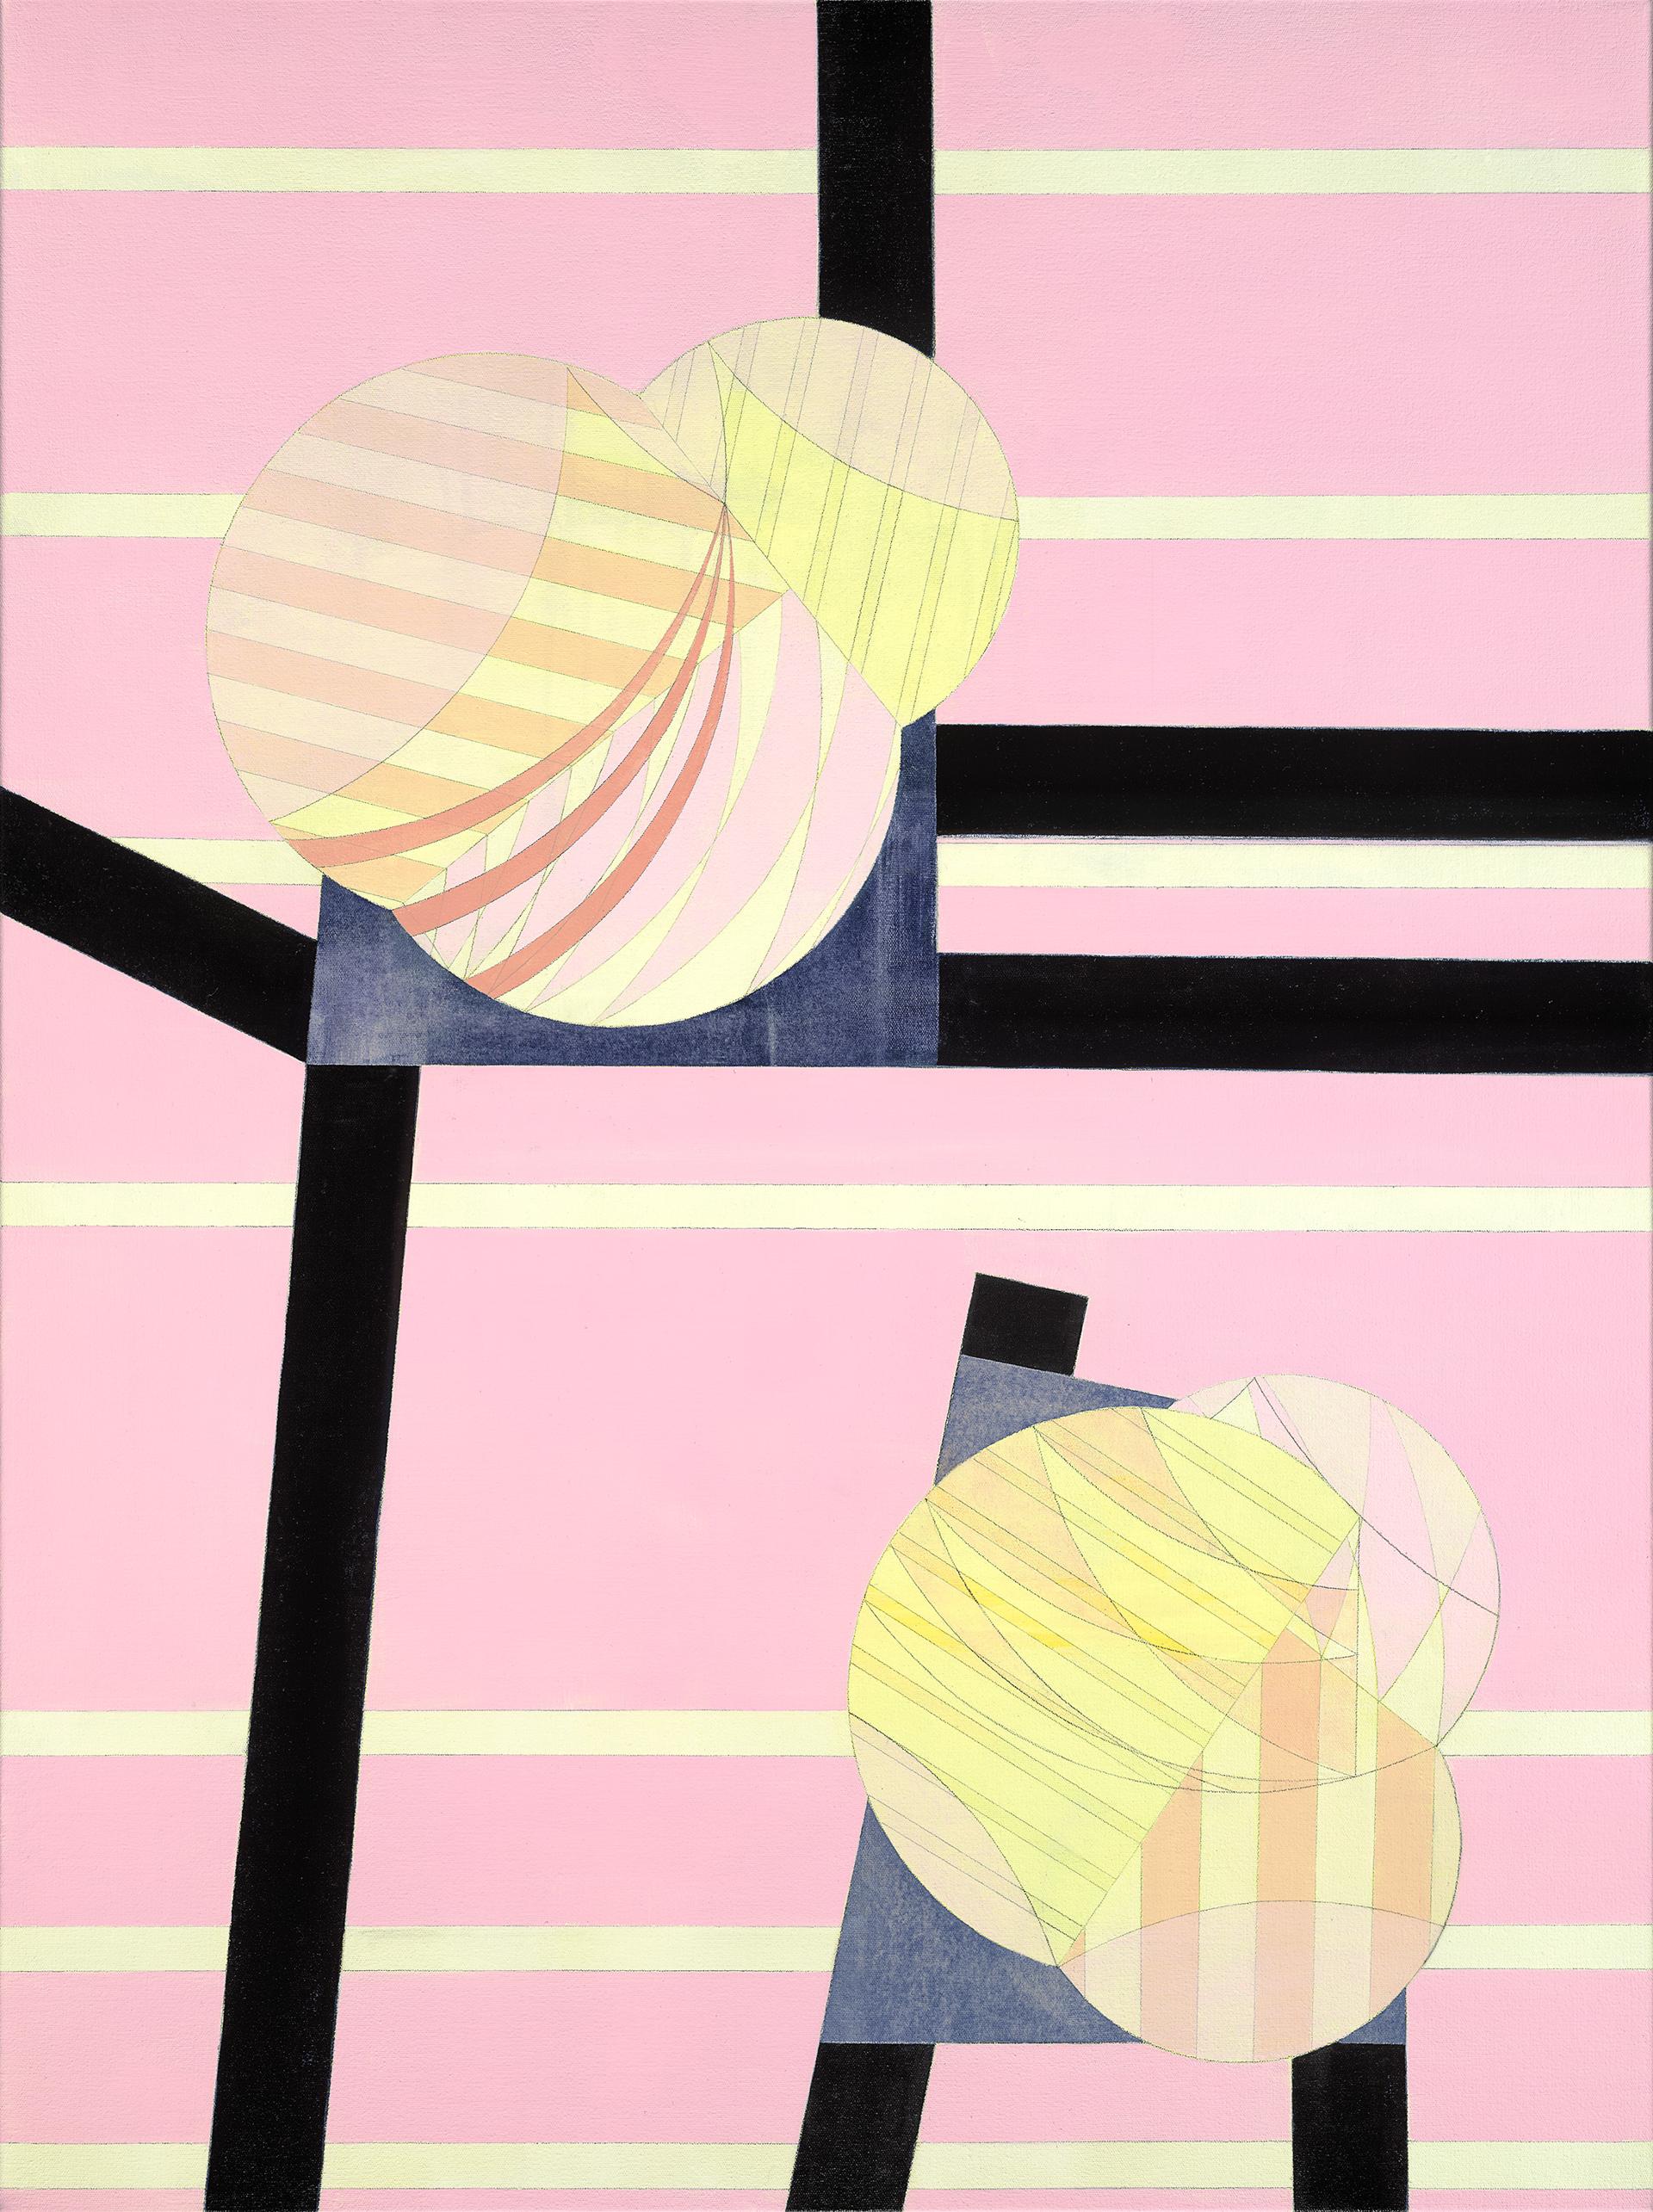 Adaregan by Kuzana Ogg